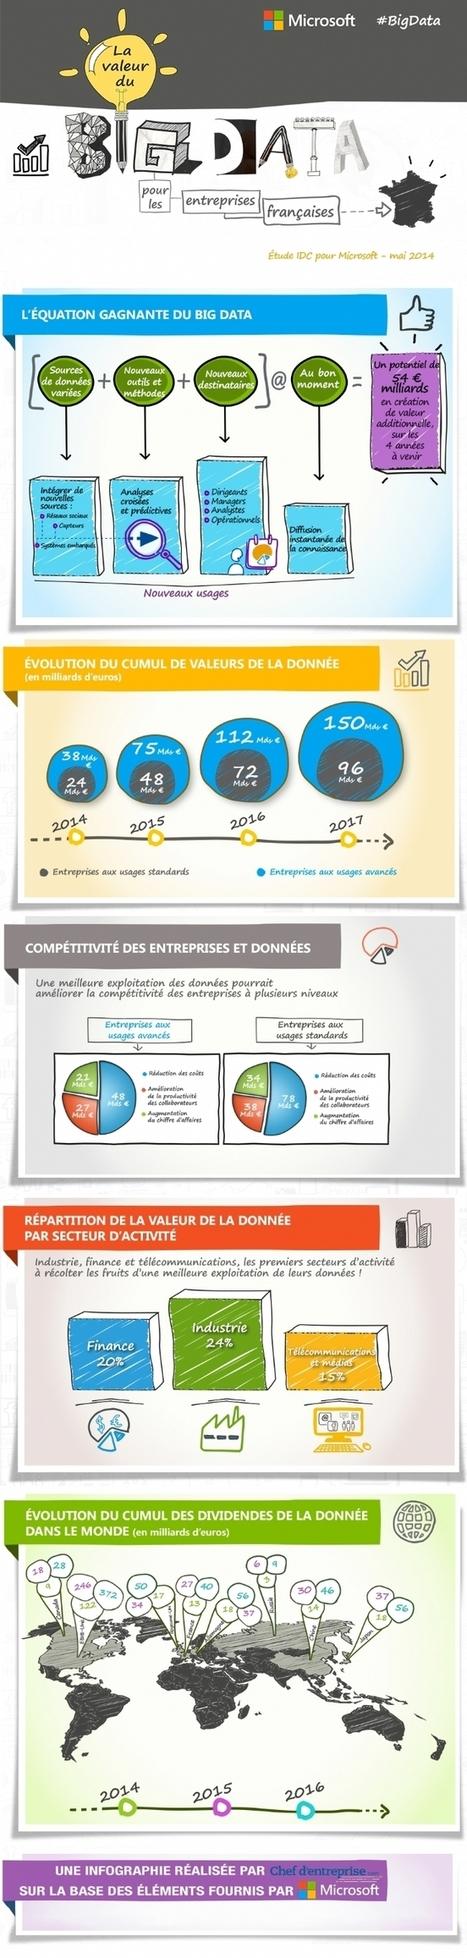 La manne du big data | Advertising 2 | Scoop.it